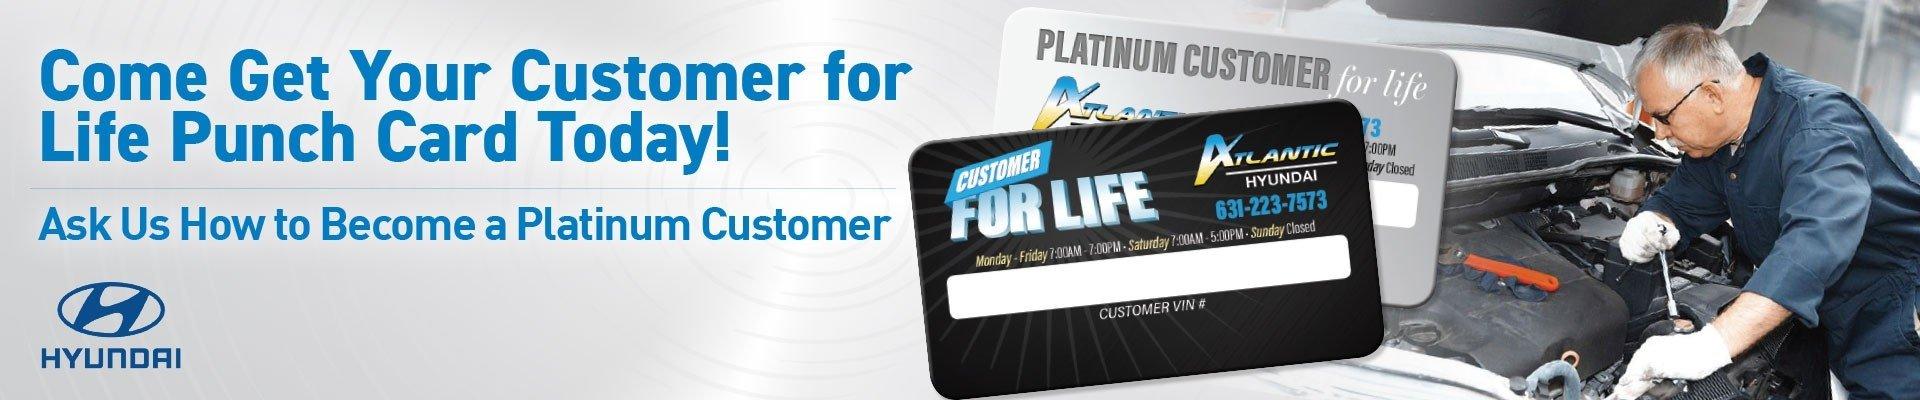 Long island hyundai dealer atlantic hyundai of west islip ny customer for life punch card reheart Images